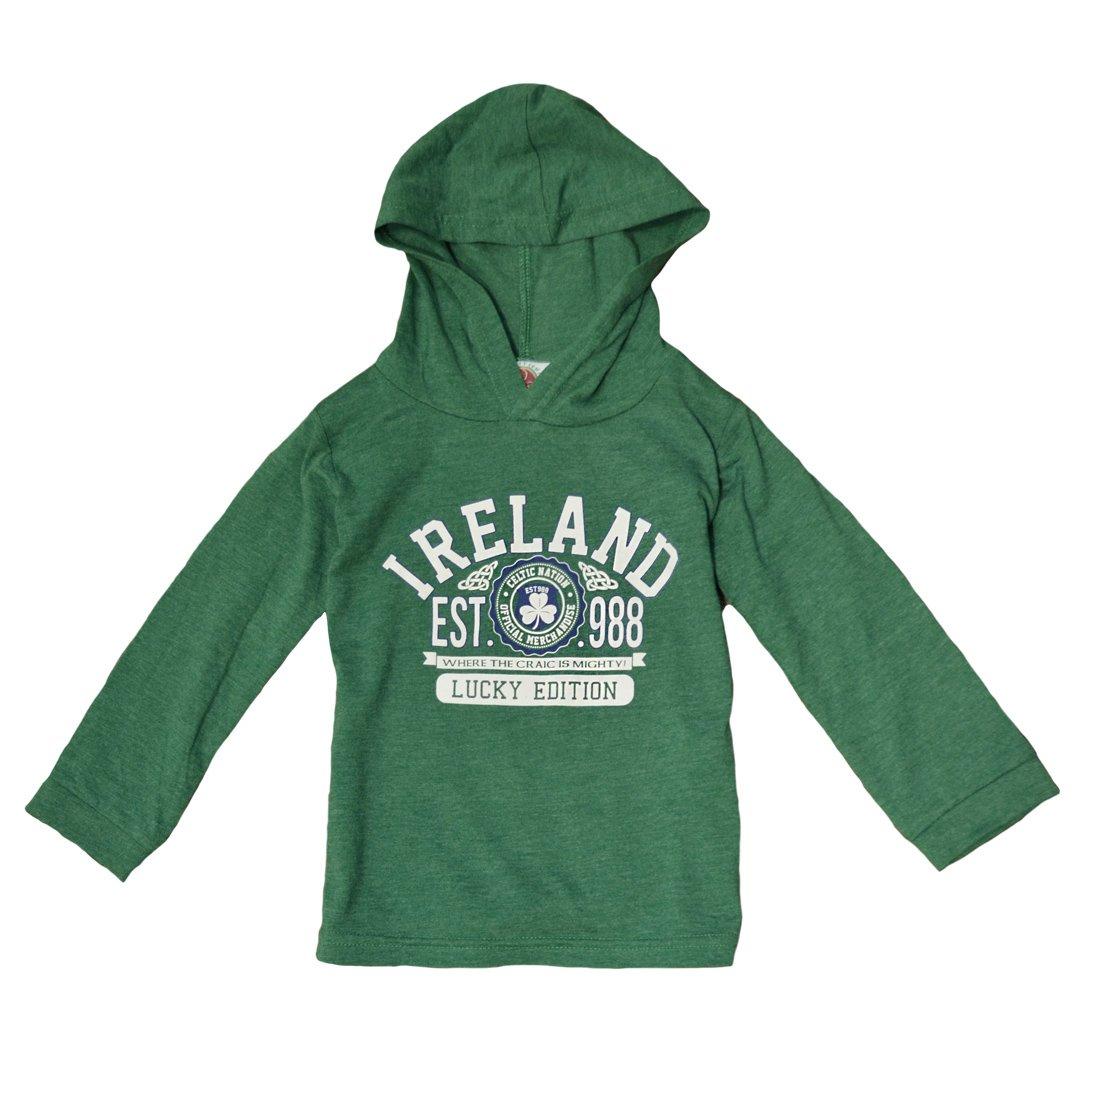 Carrolls Irish Gifts Green Ireland Lucky Edition Kids Hoodie 3 4 Years